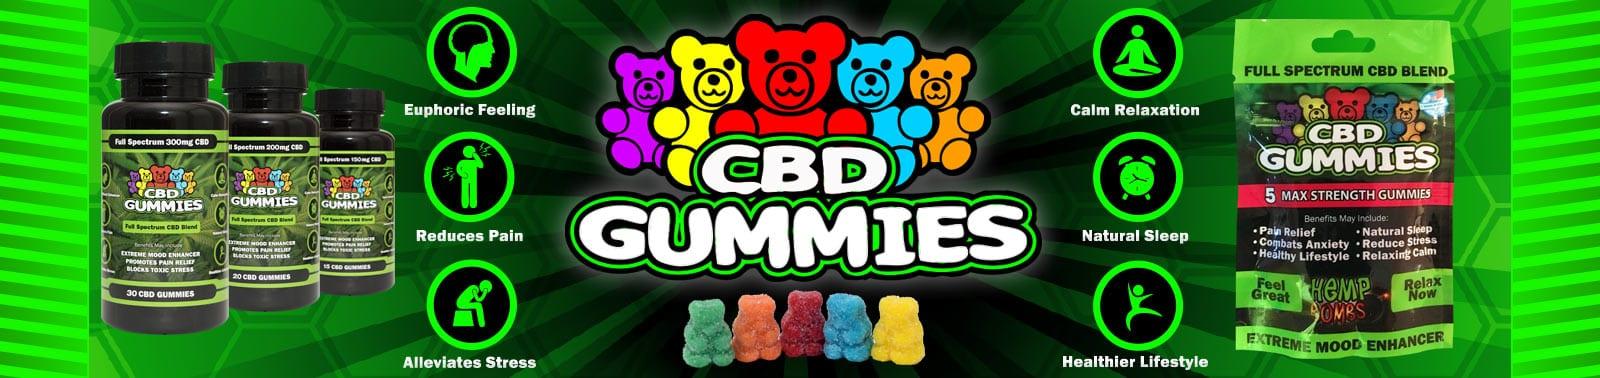 Hemp Bombs Premium CBD Gummies